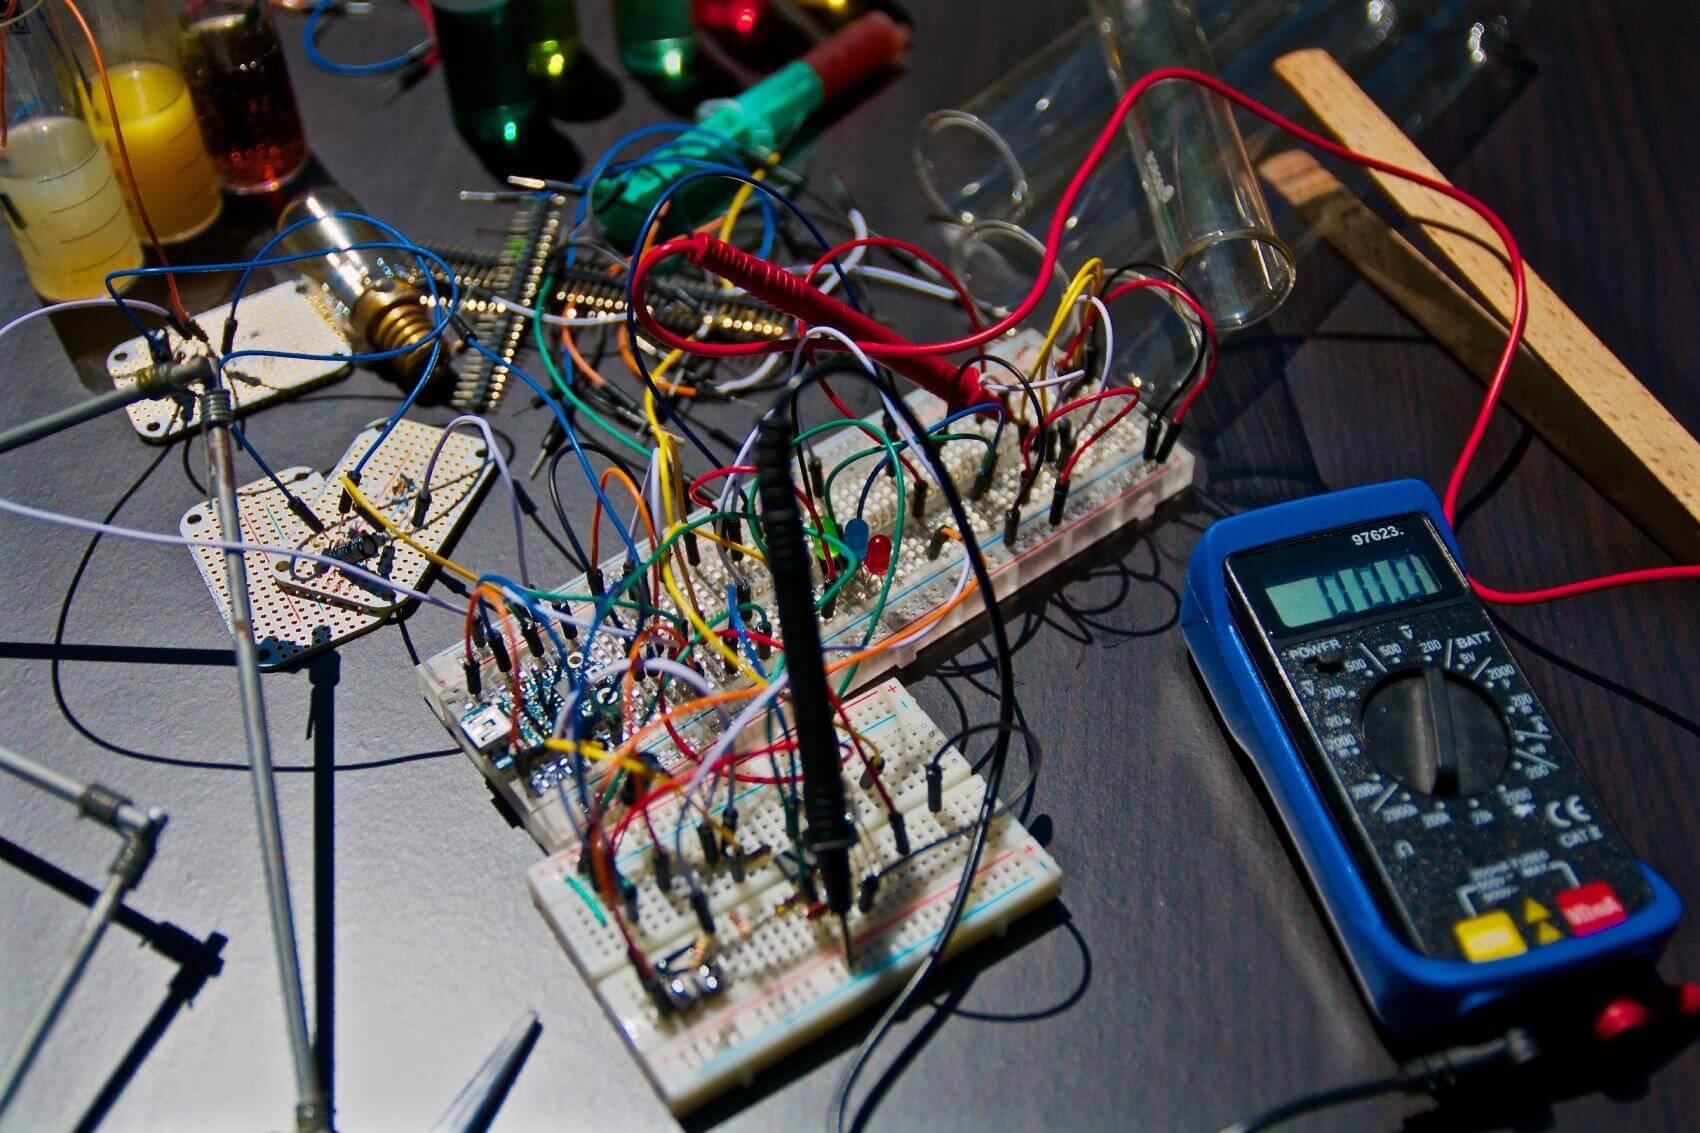 engineering - nicolas-thomas-540353-unsplash